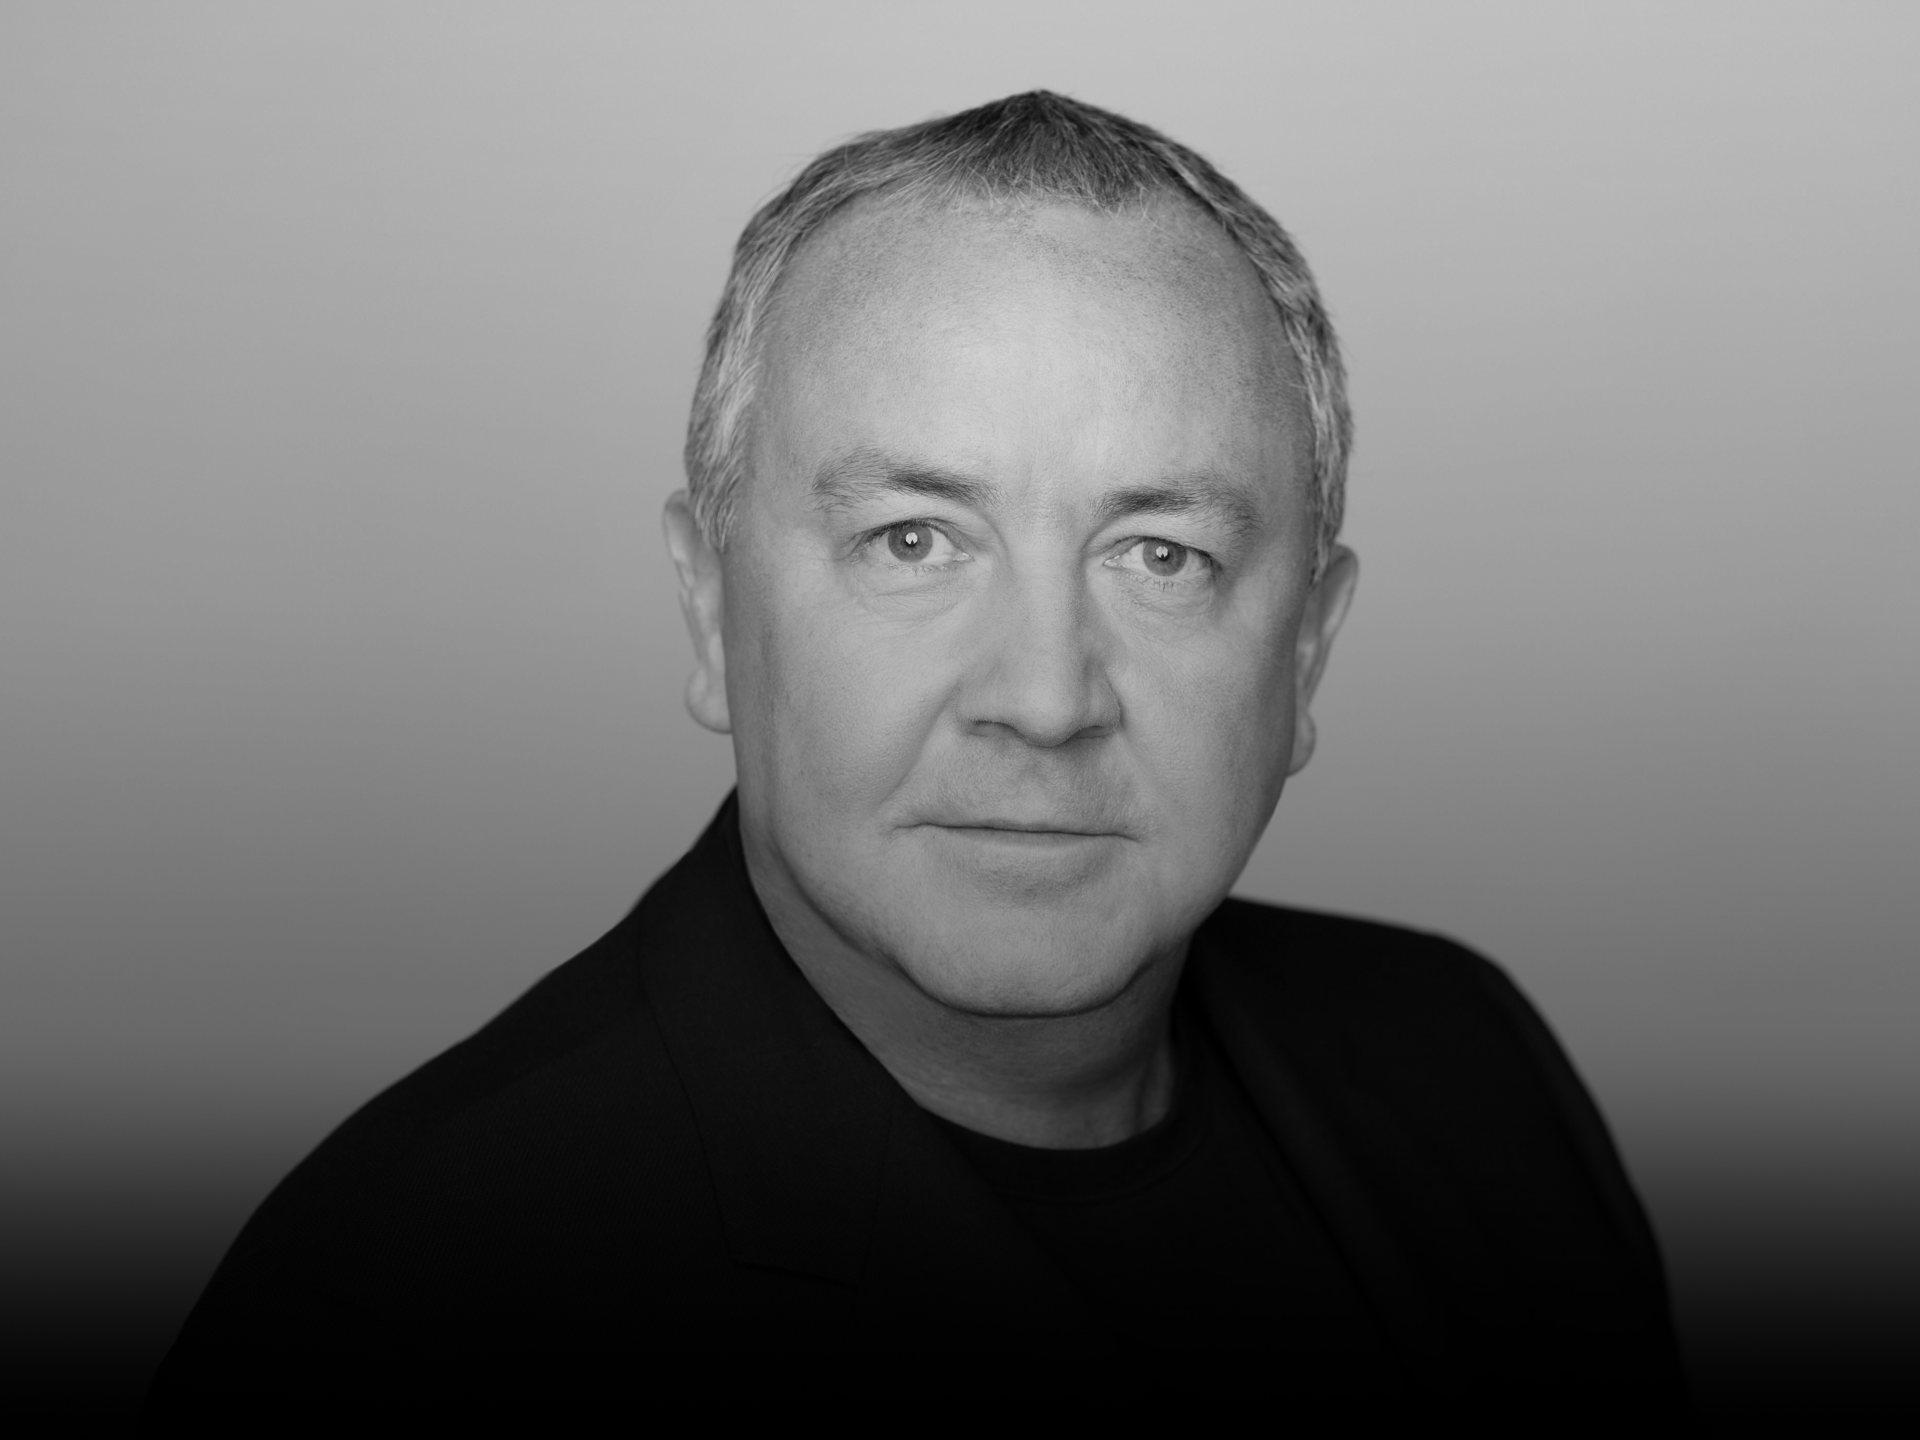 Image of Mark Tutssel